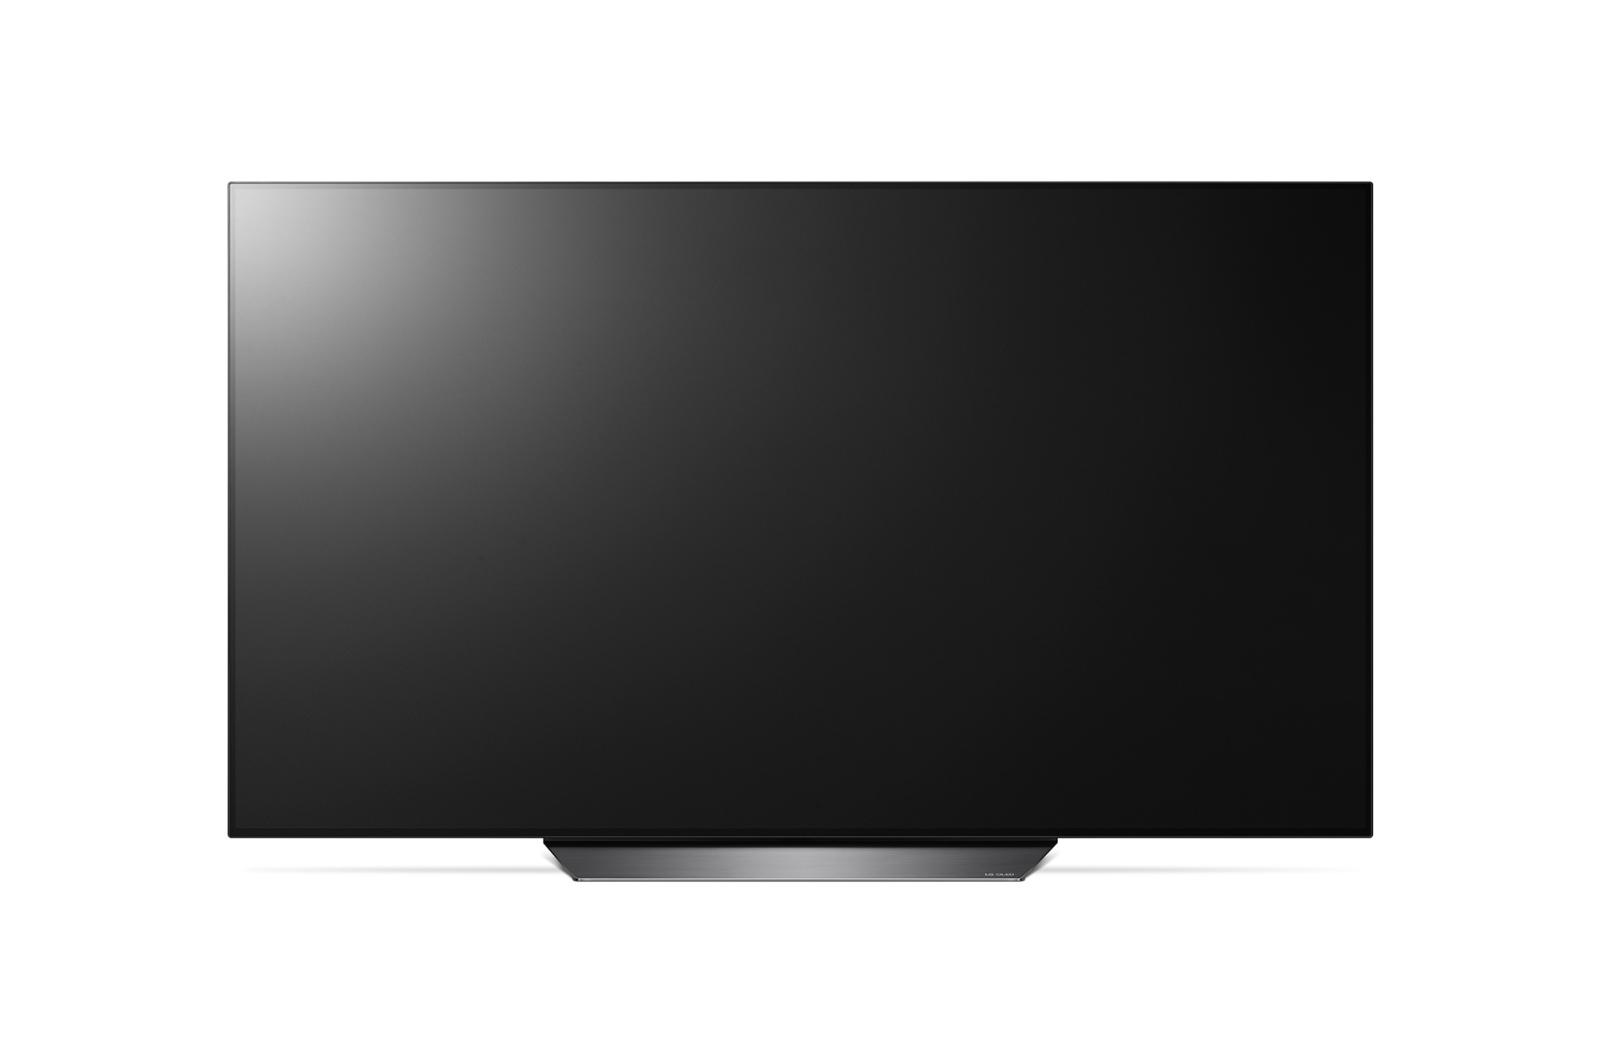 LG OLED65B8PLA telewizor premium OLED